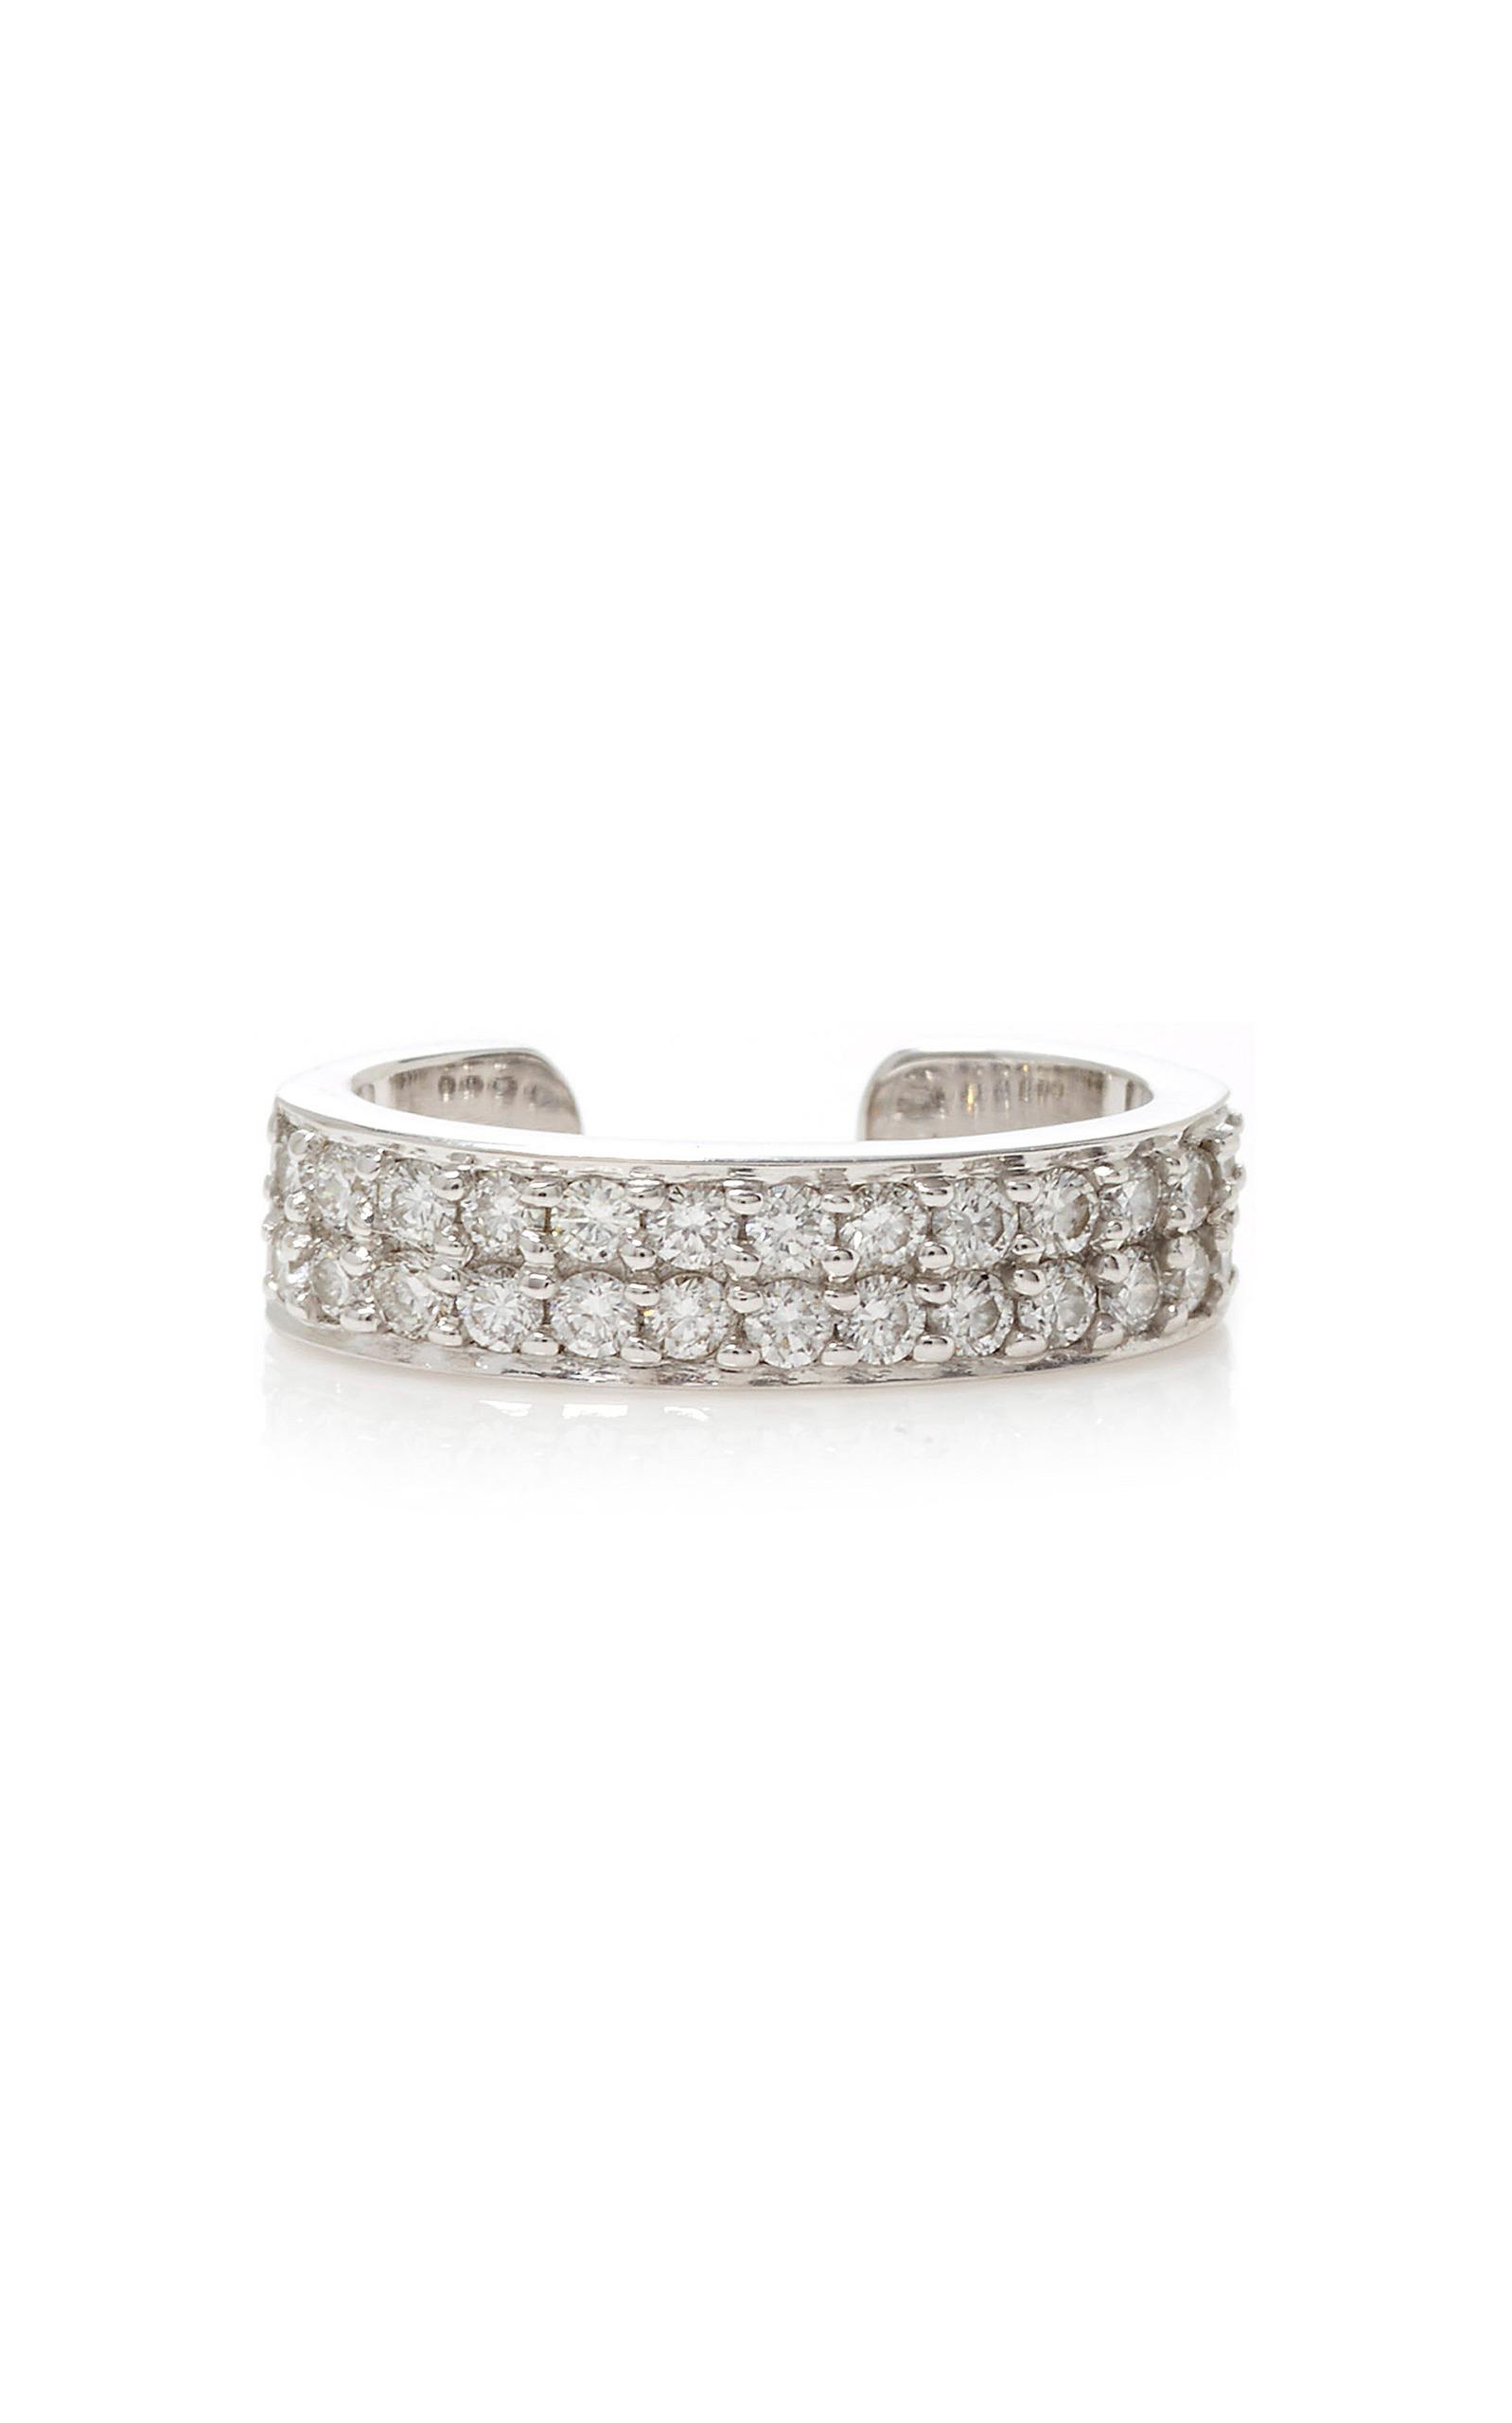 6c4813e11 Double Row Diamond Ear Cuff in White Gold by Anita Ko | Moda Operandi